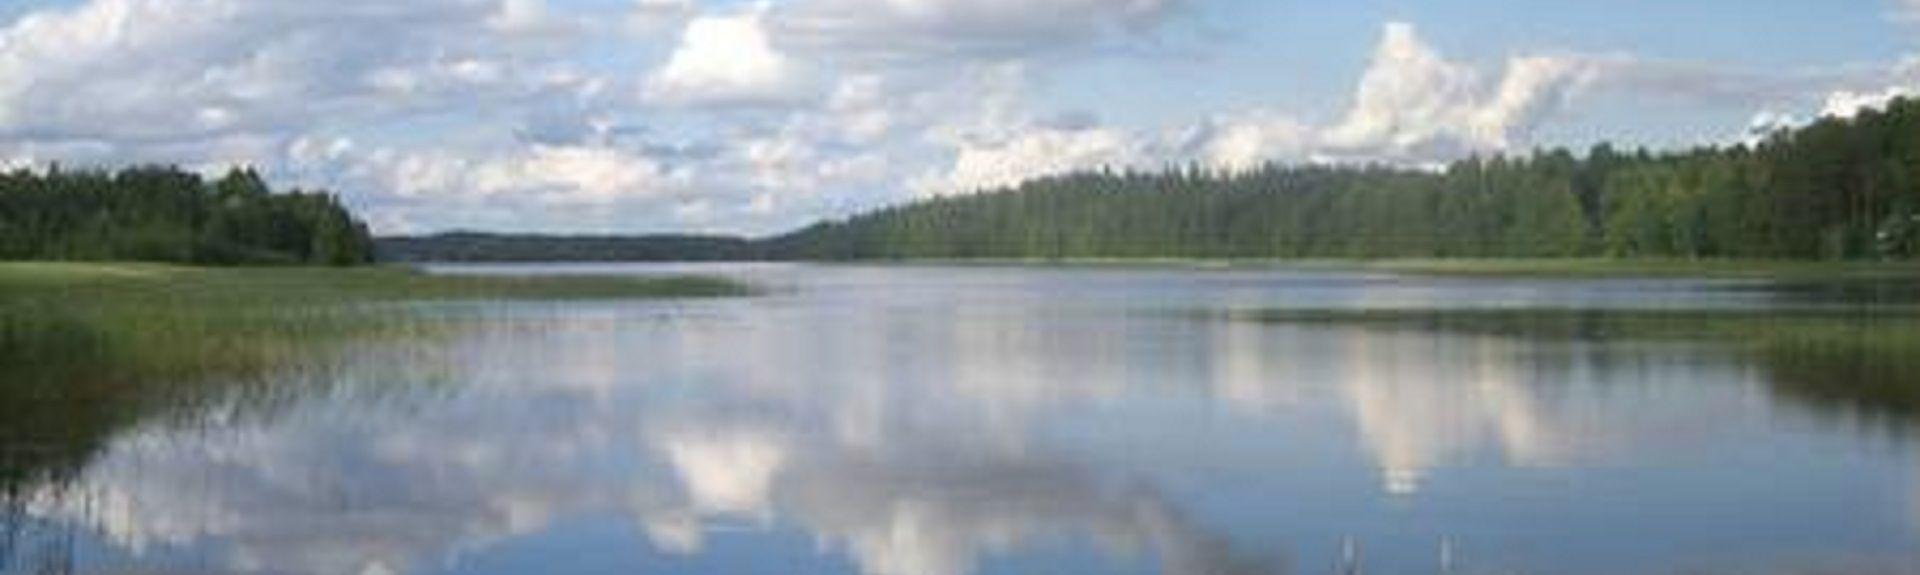 Hollola, Finland